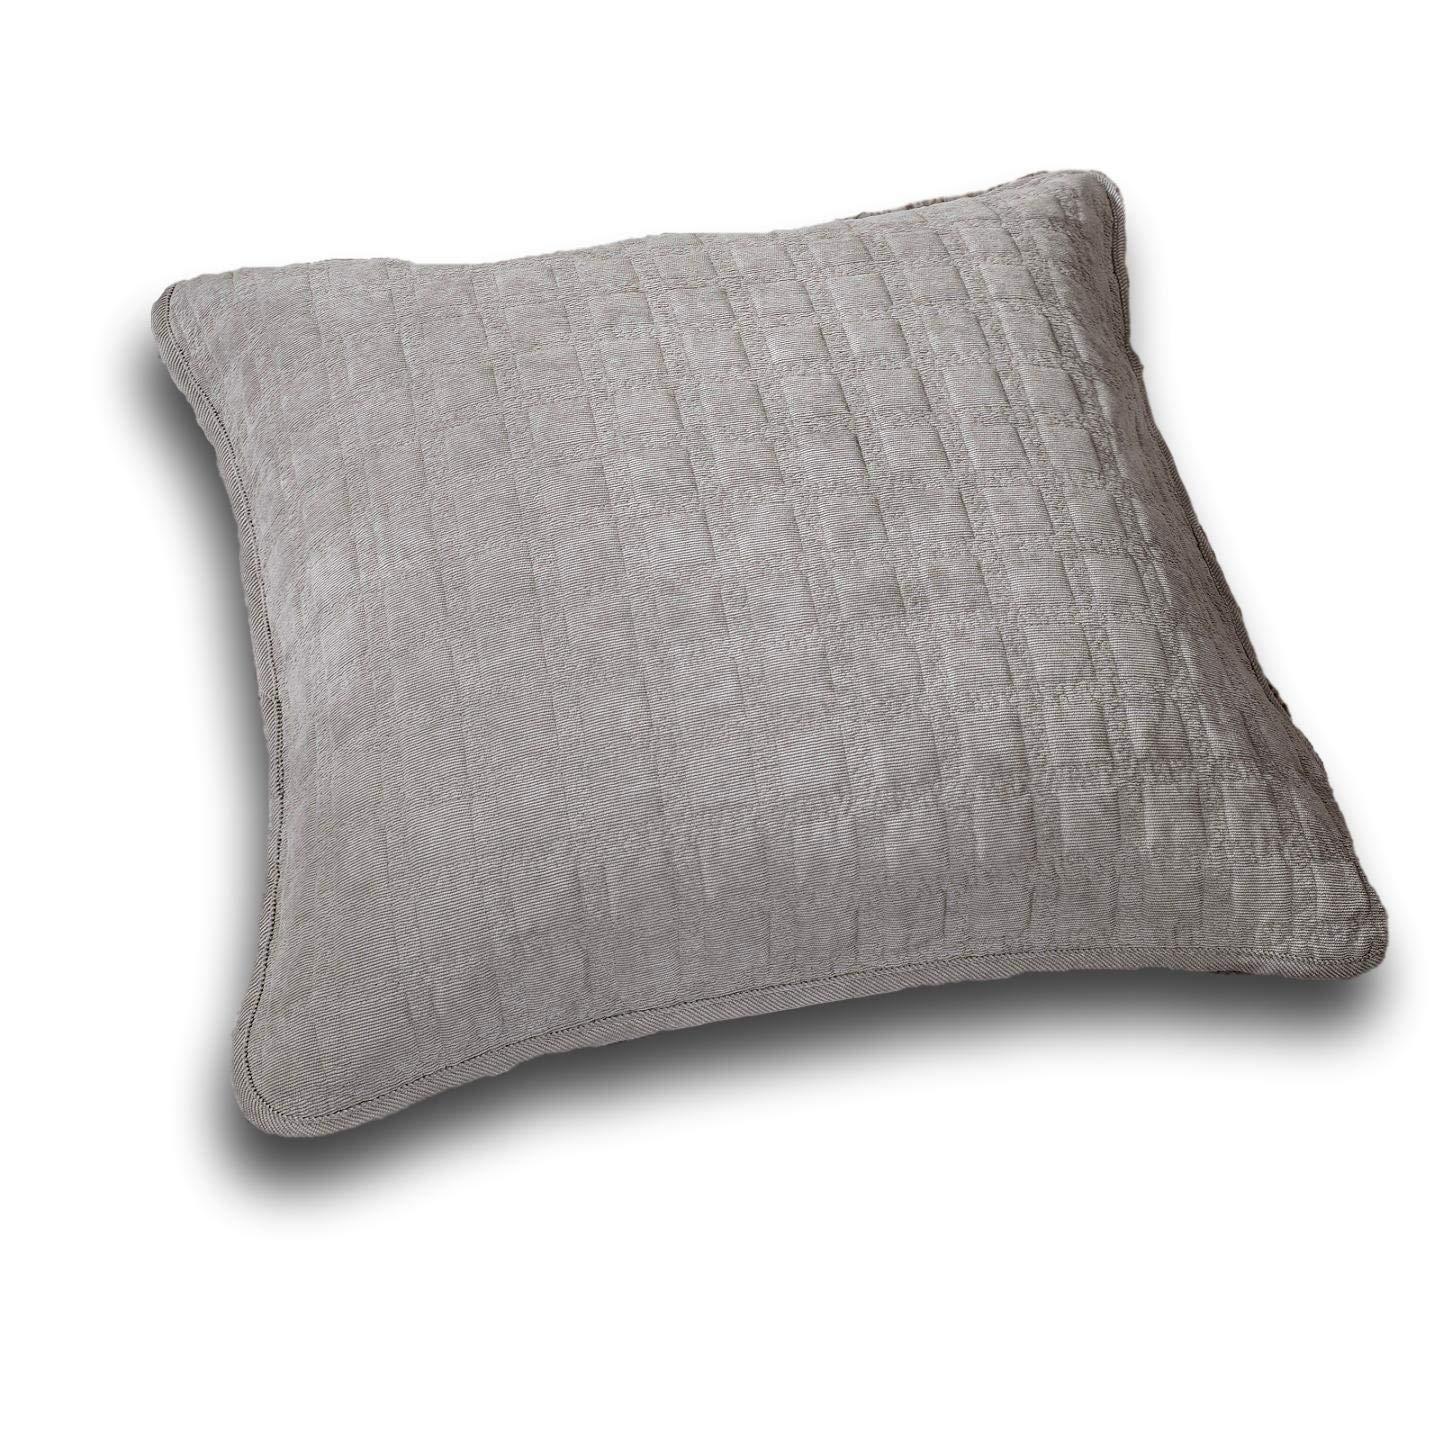 Grey Euro Sham DaDa Bedding Collection Bedspread Set, Queen, Grey